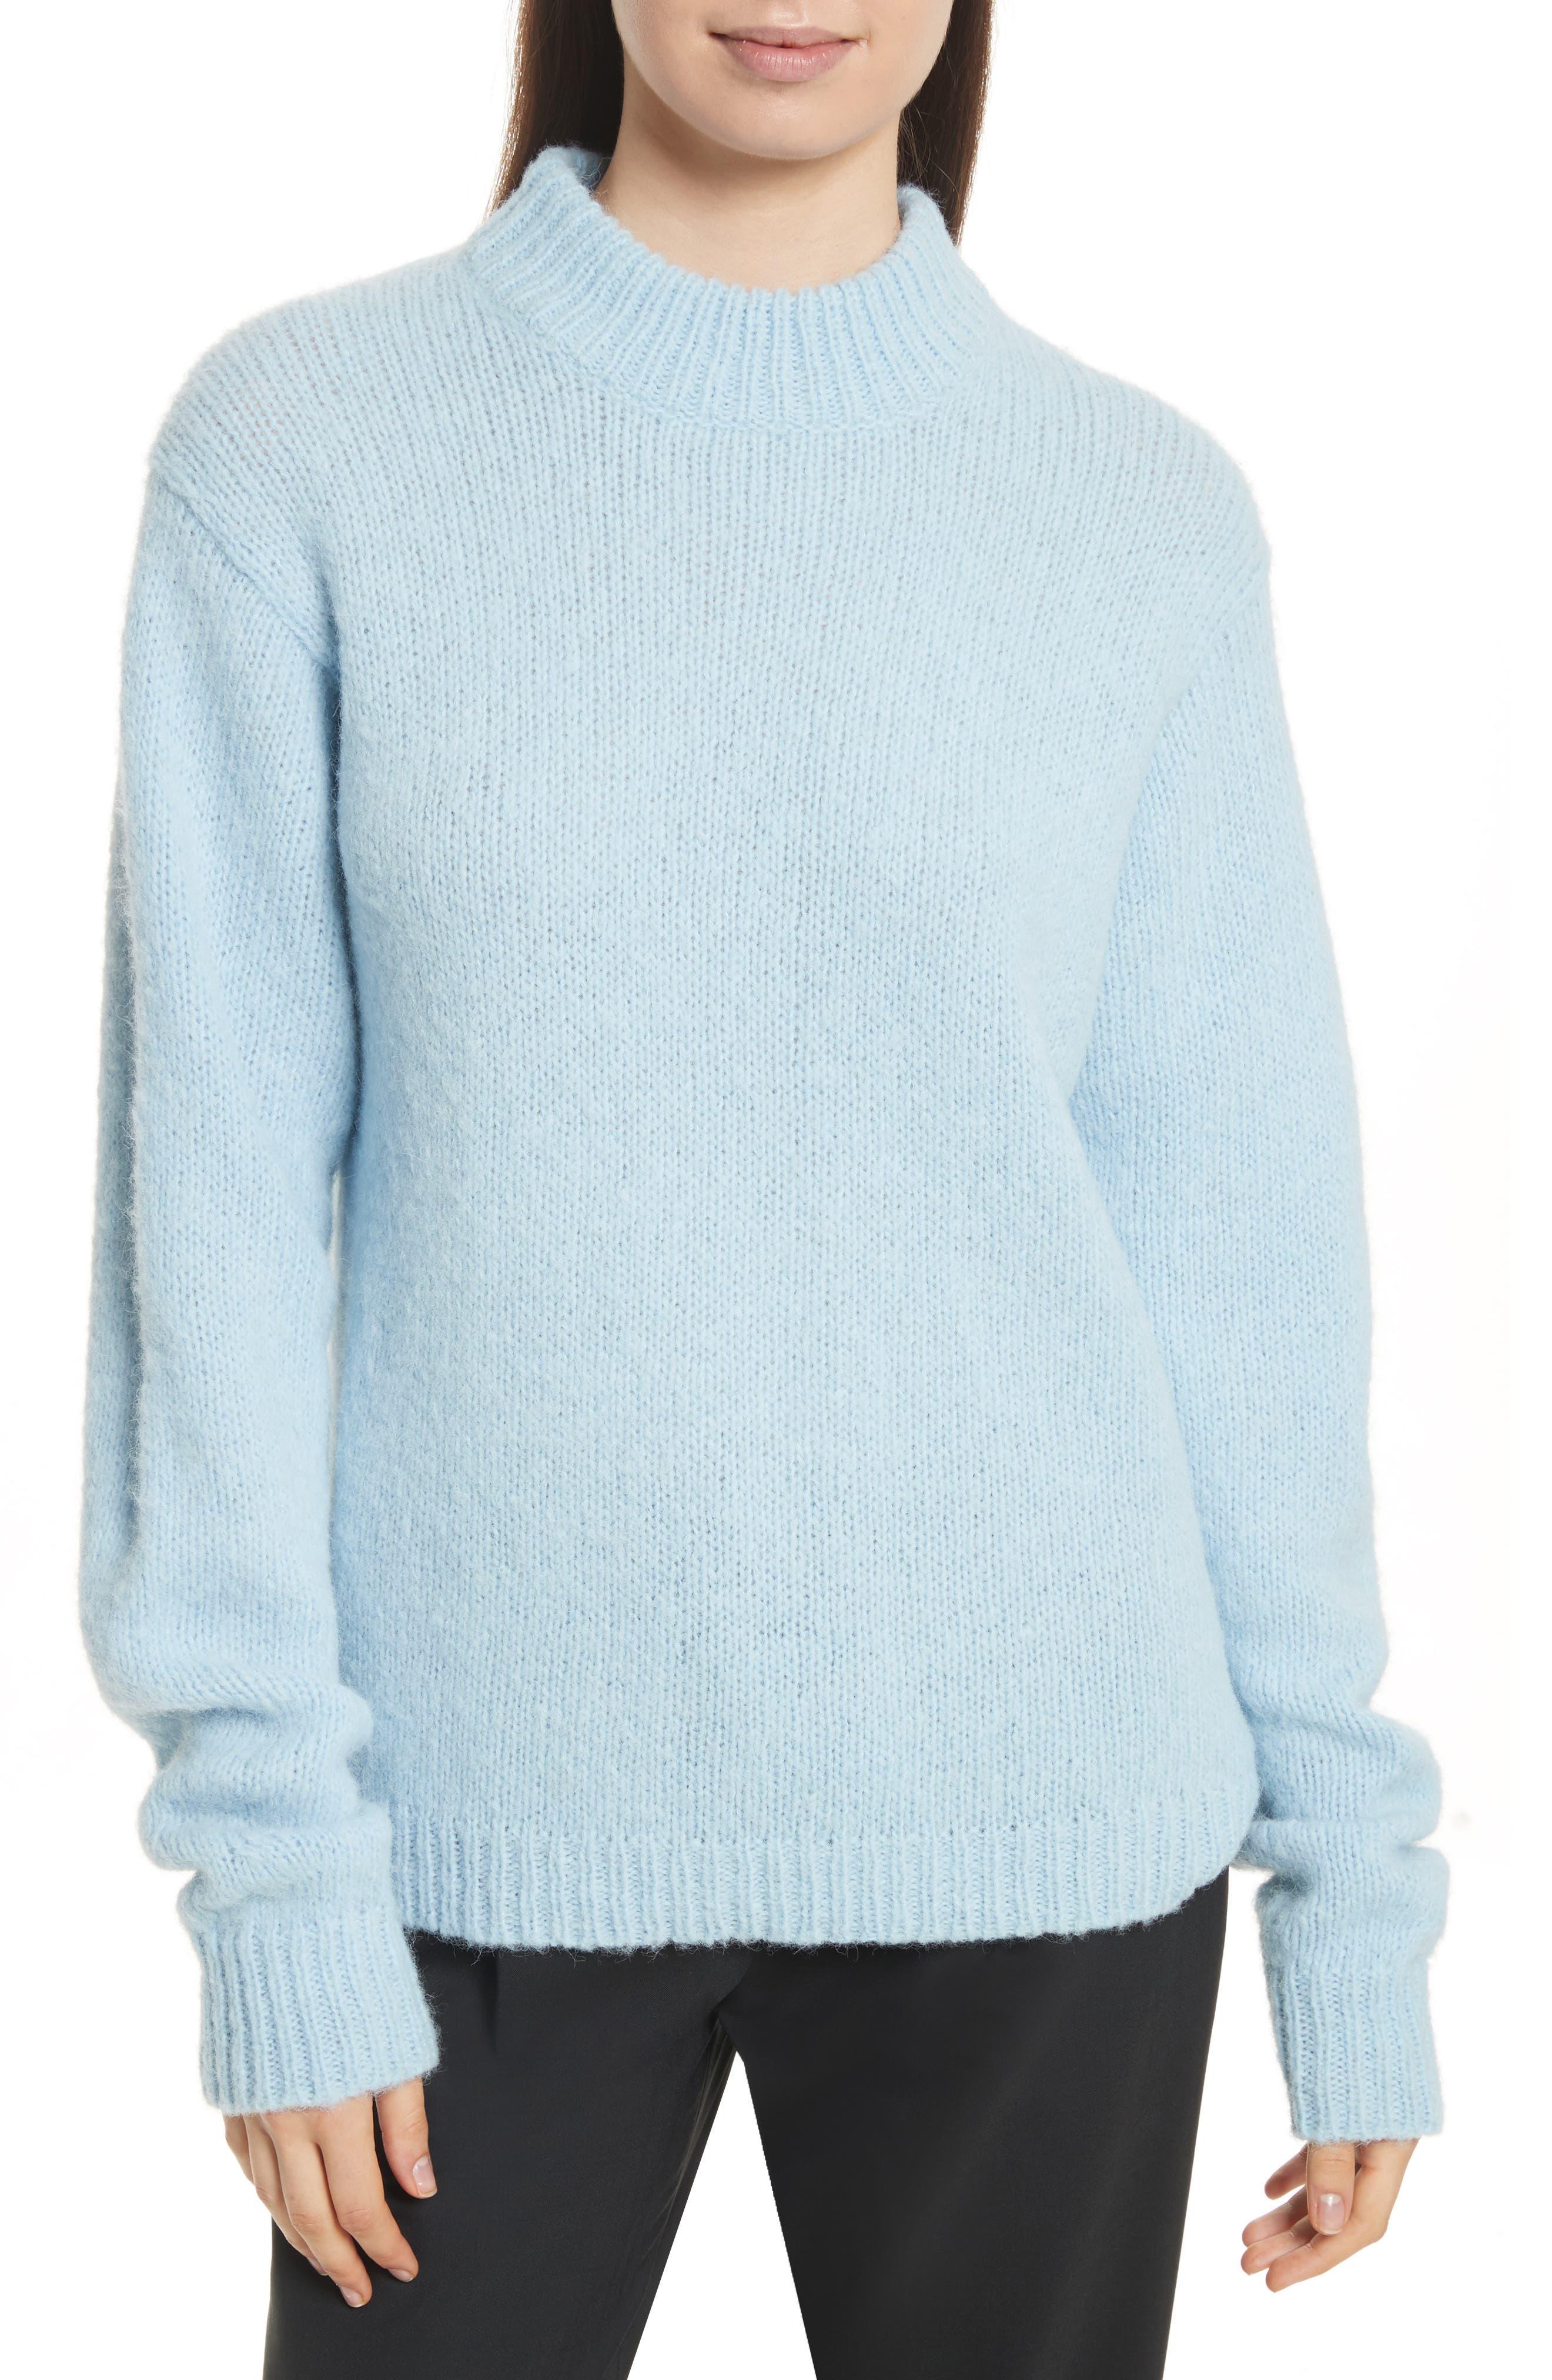 Cozette Easy Mock Neck Pullover,                             Main thumbnail 1, color,                             450